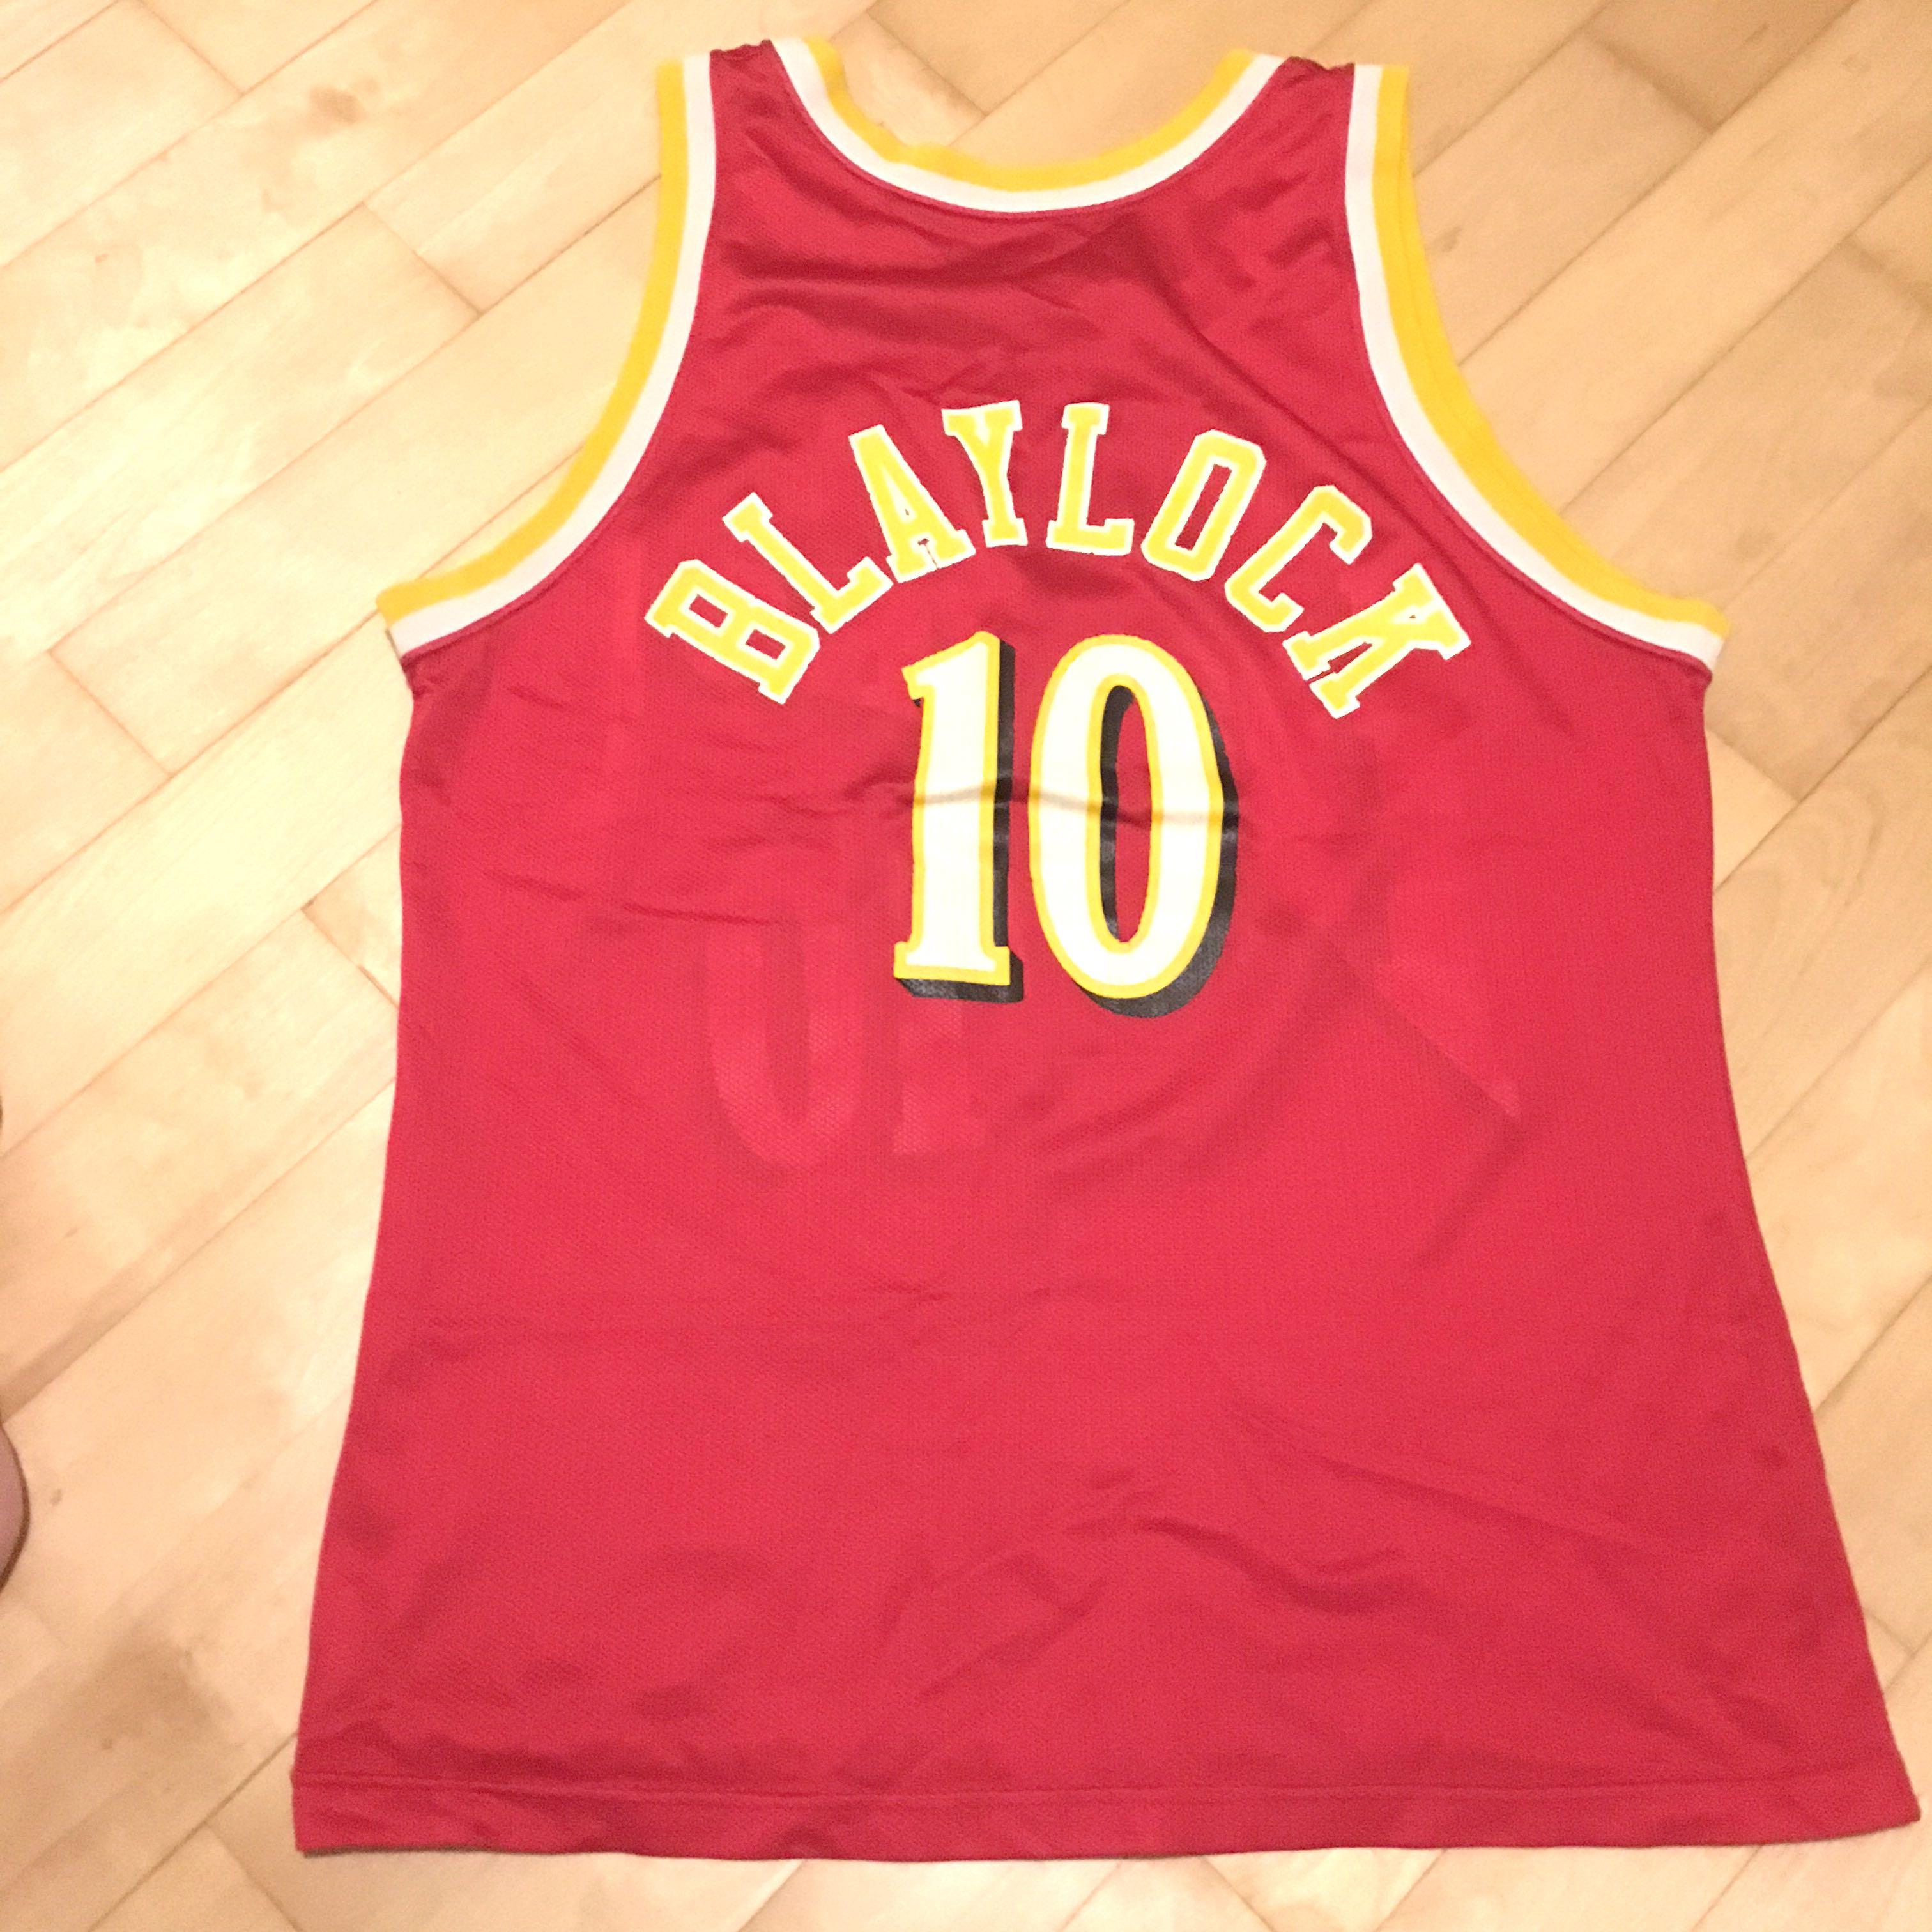 3297a4611c3 Authentic Champion NBA Atlanta Hawks Mookie Blaylock Jersey